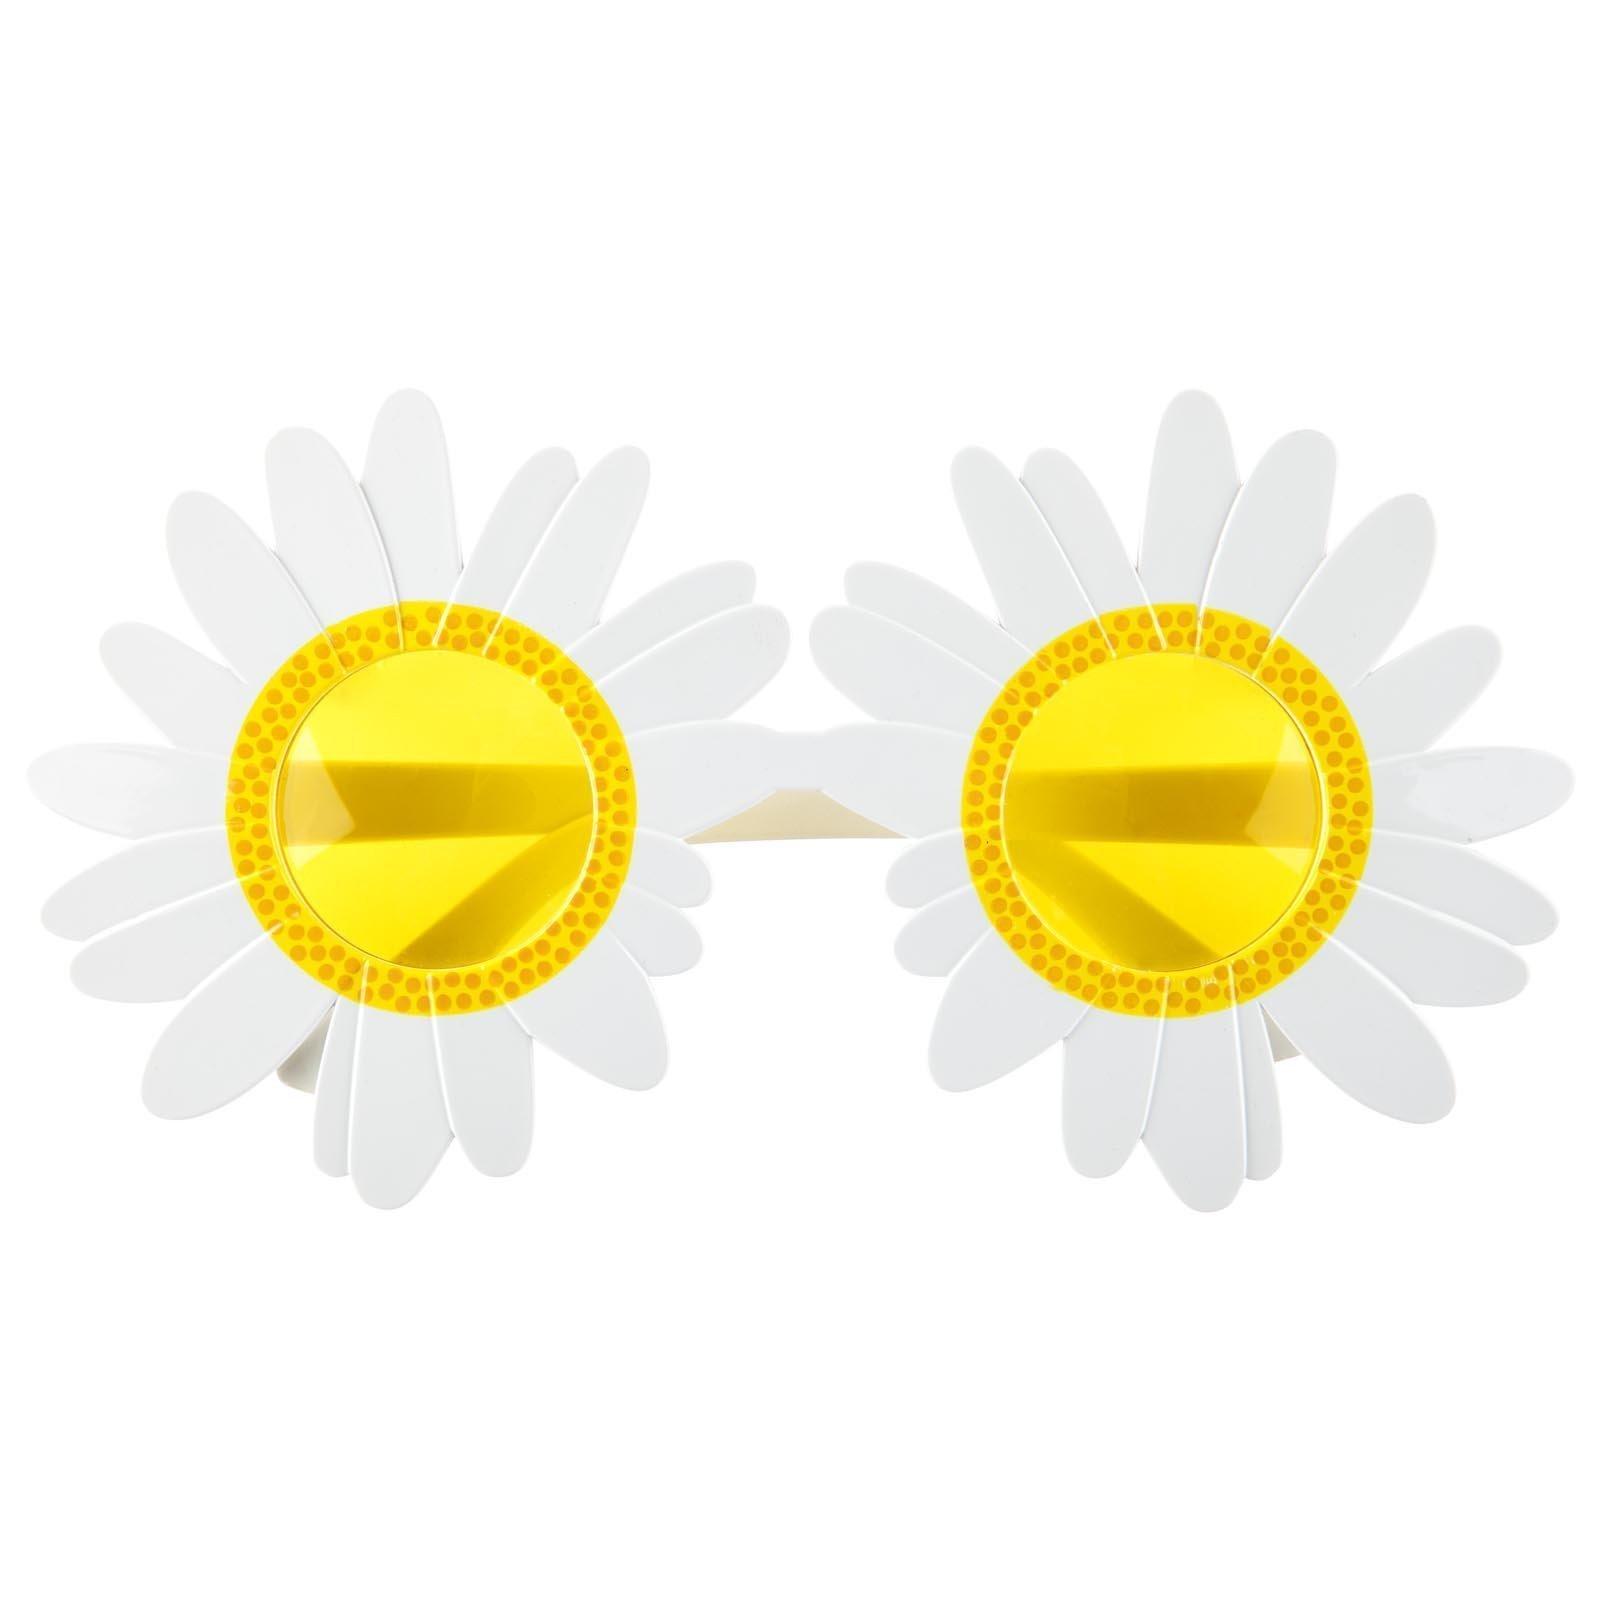 SunnyLIFE UV 380 Sunnies - Sunglasses w/Fun Summer Designs - Daisy White